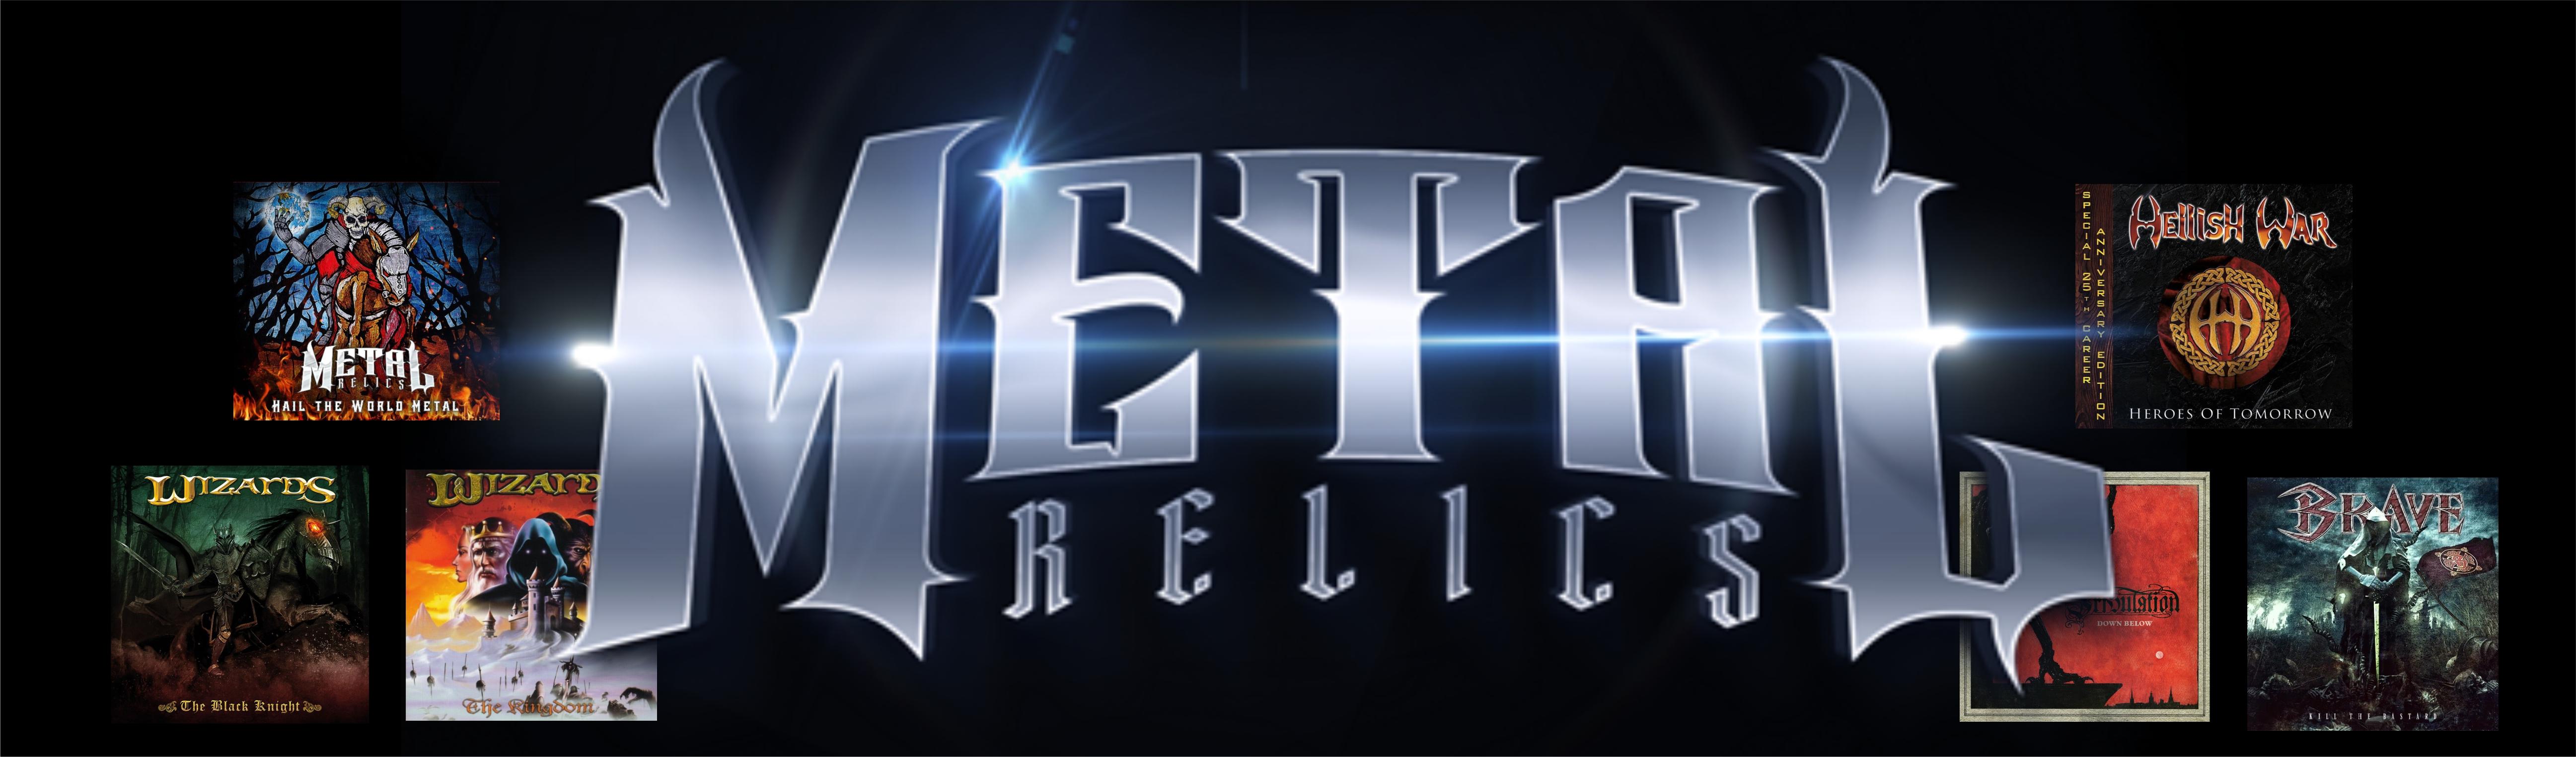 Metal-relics_Slider